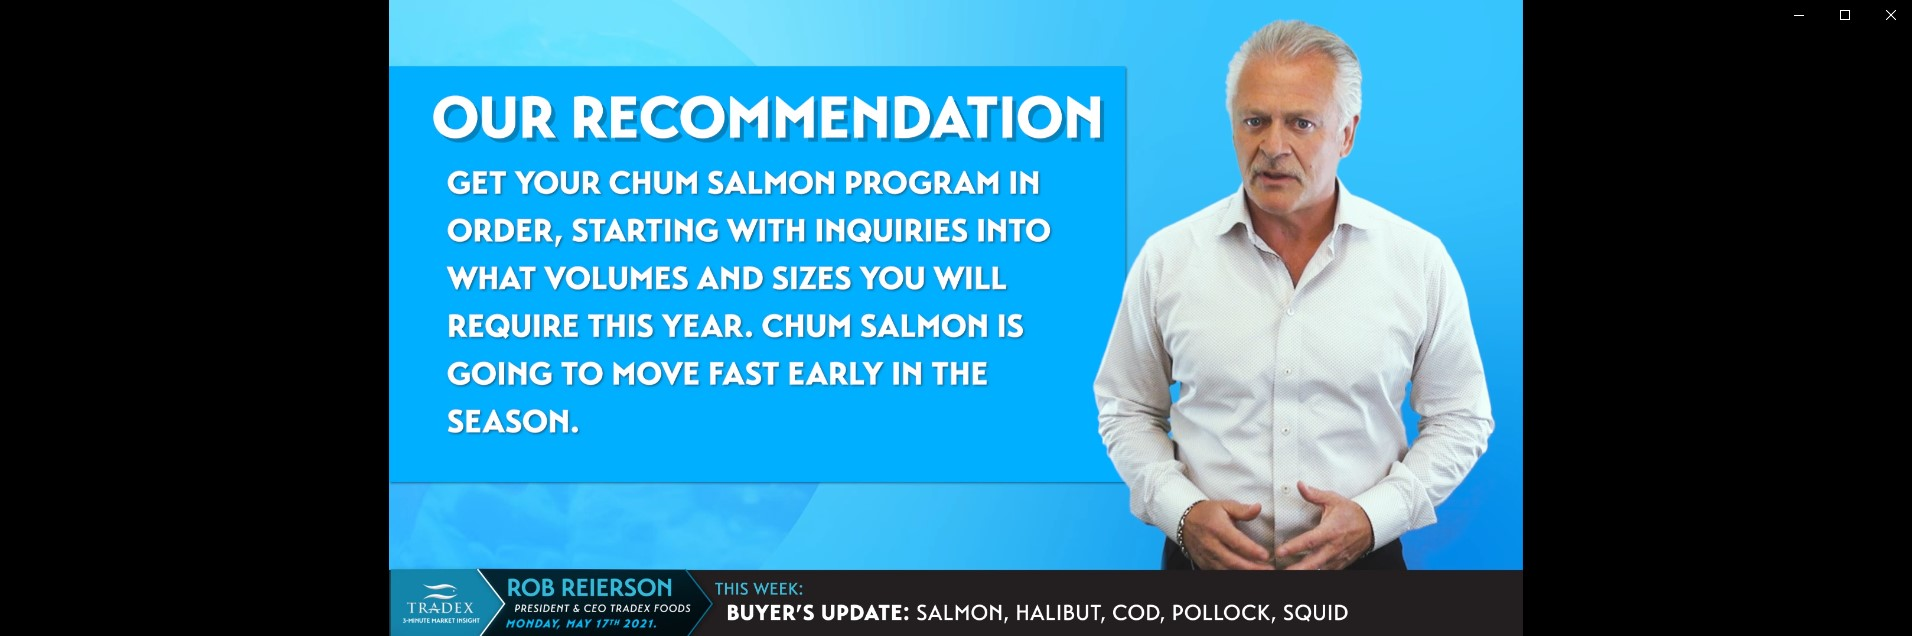 Chum Salmon Recommendation